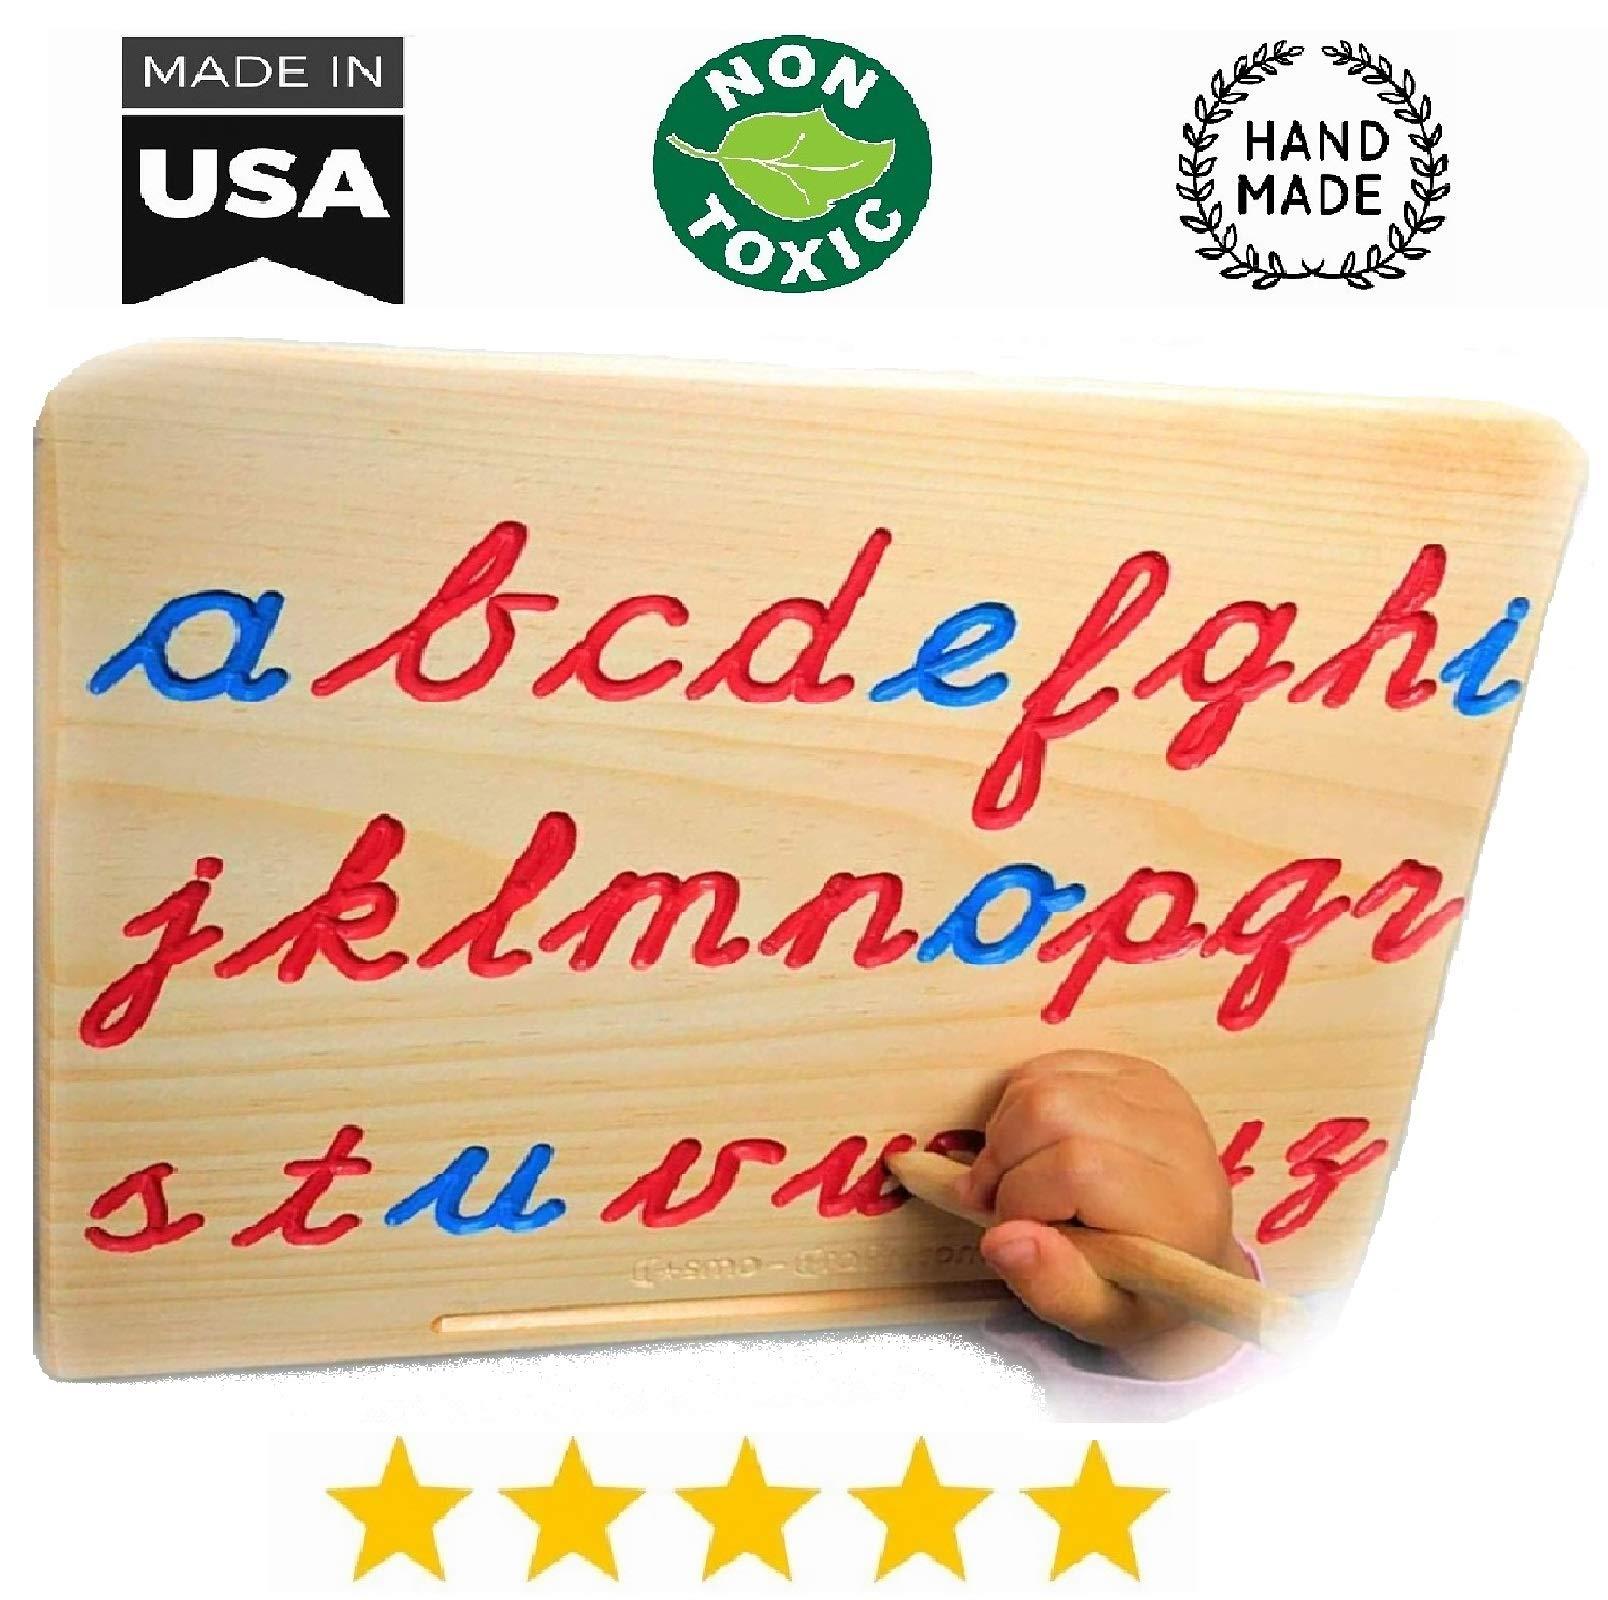 Montessori Cursive Alphabet   Lowercase   Cursive ABC Letters Tracing Board with Wooden Pen by Cosmo-Crafts ... (A- Lowercase NO Color) by cosmo-crafts.com